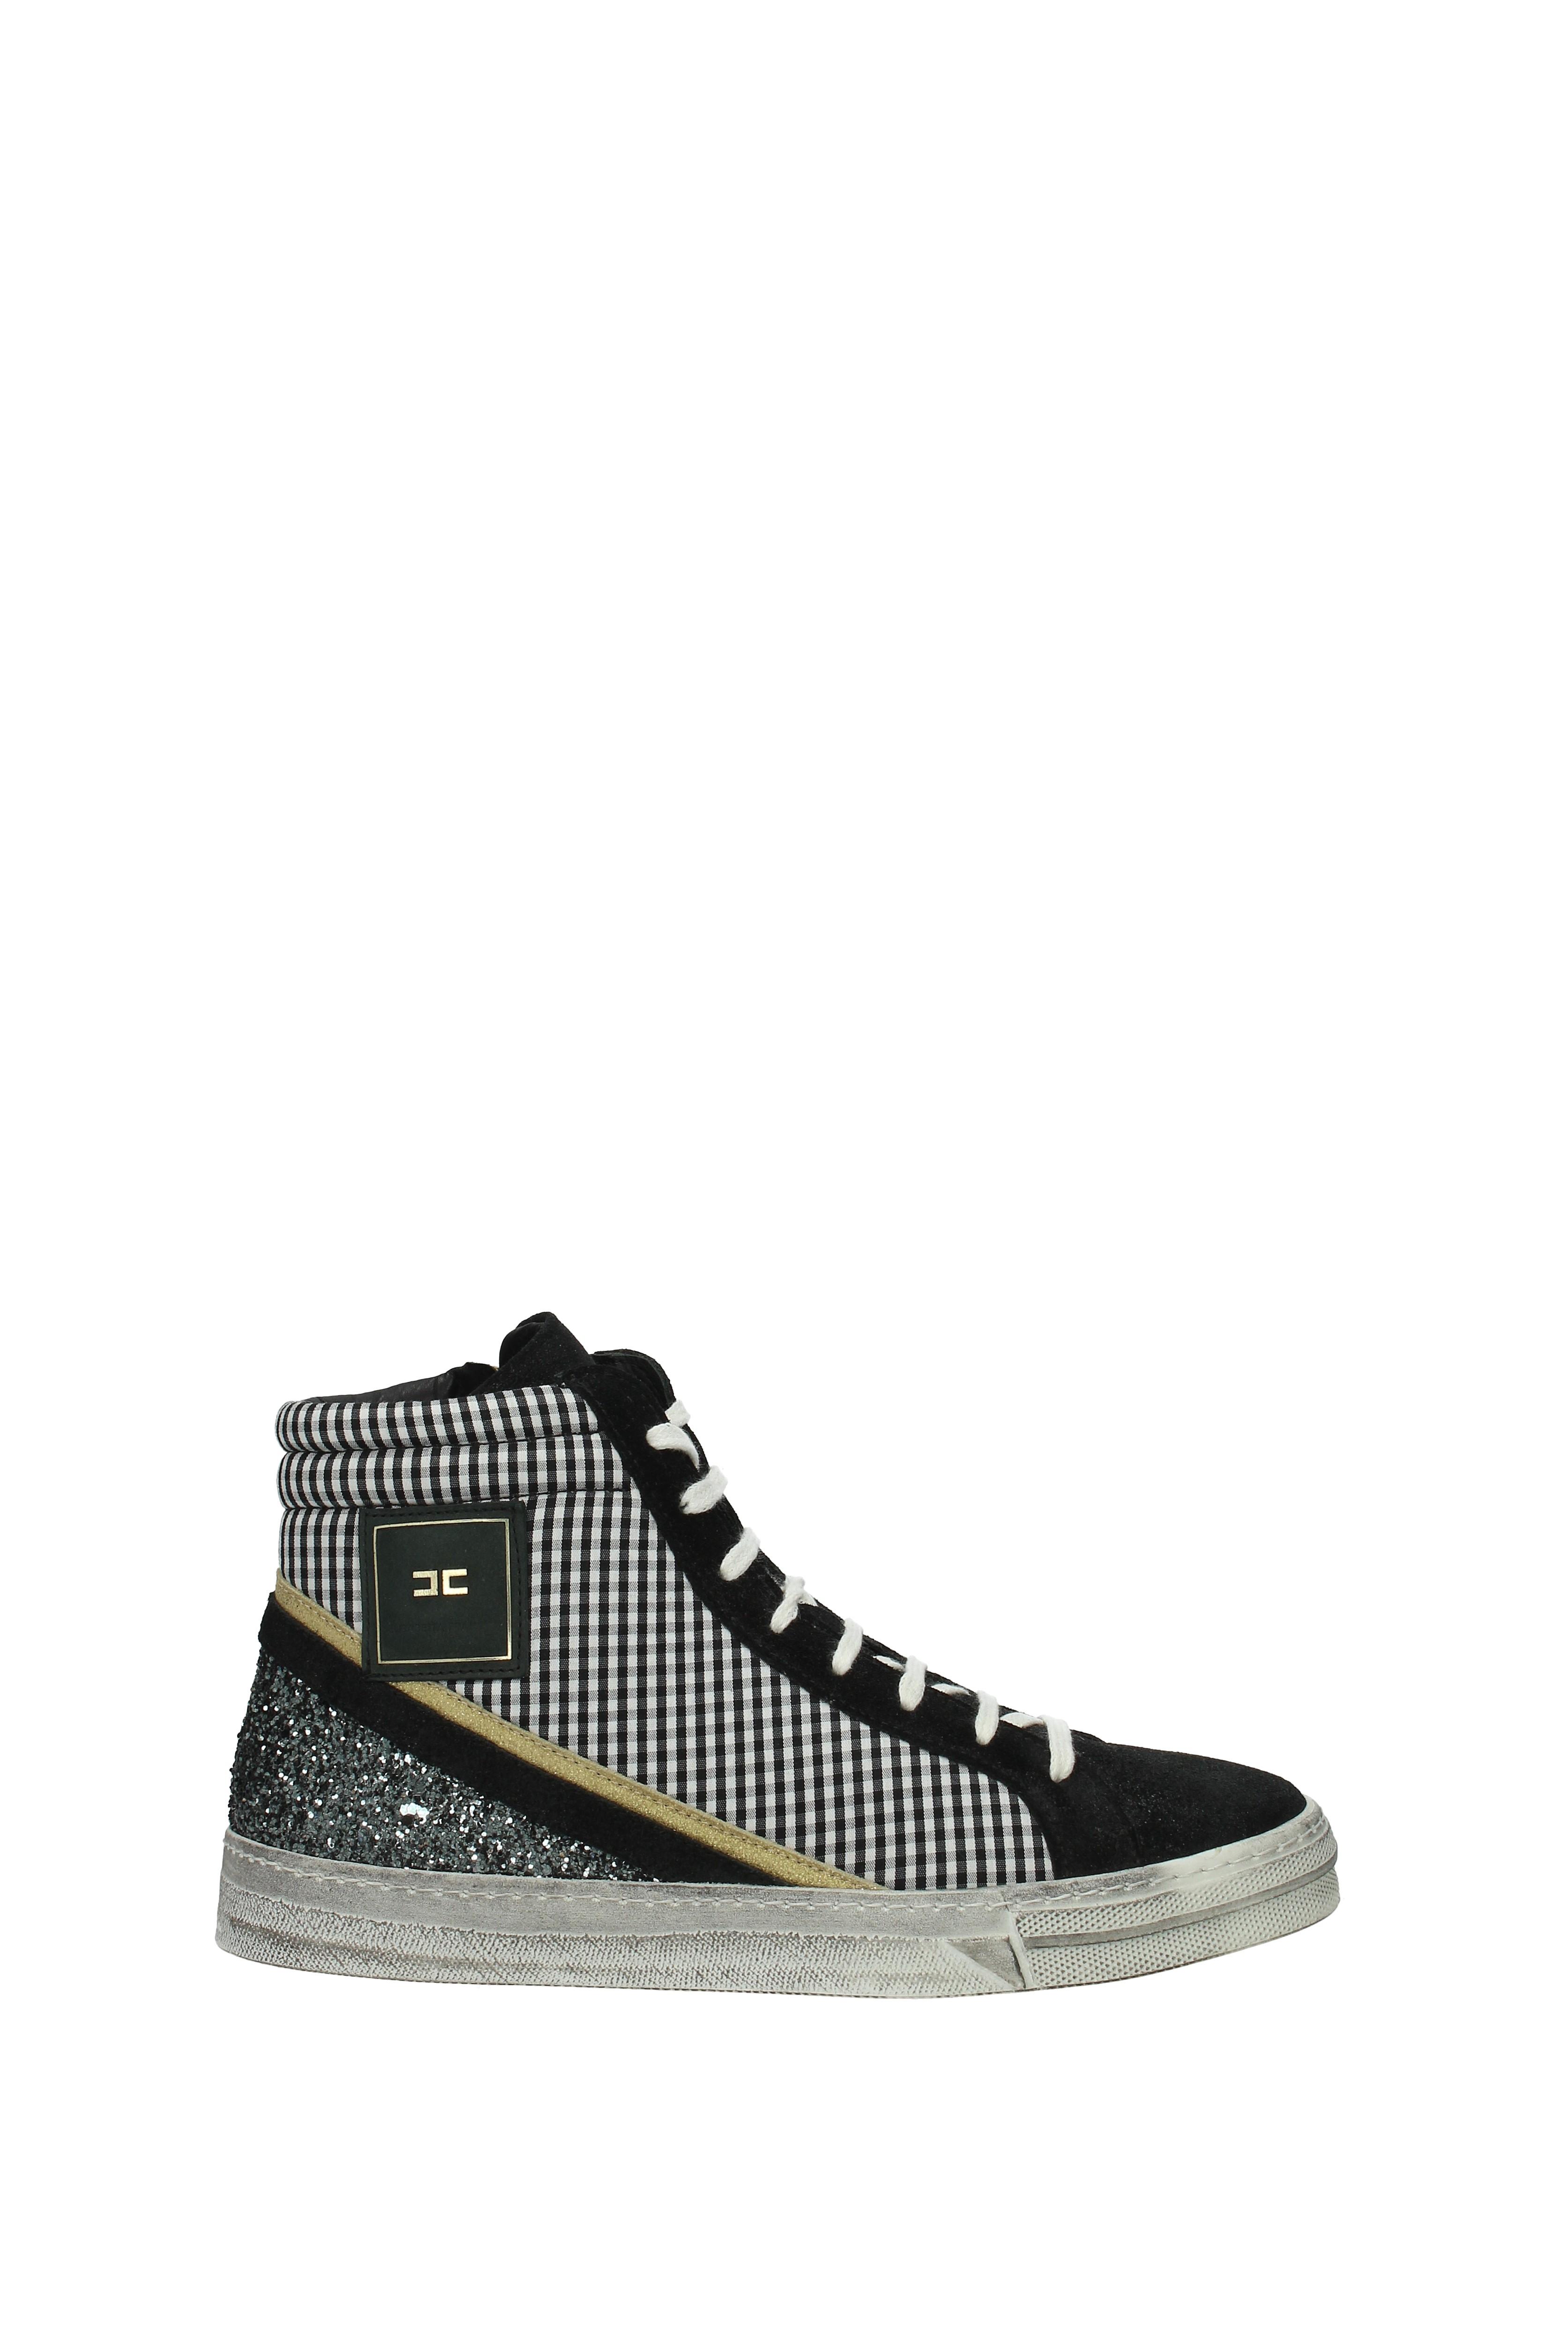 Sneakers Elisabetta Damen Franchi Damen Elisabetta - Stoff (9642284) 82dce9